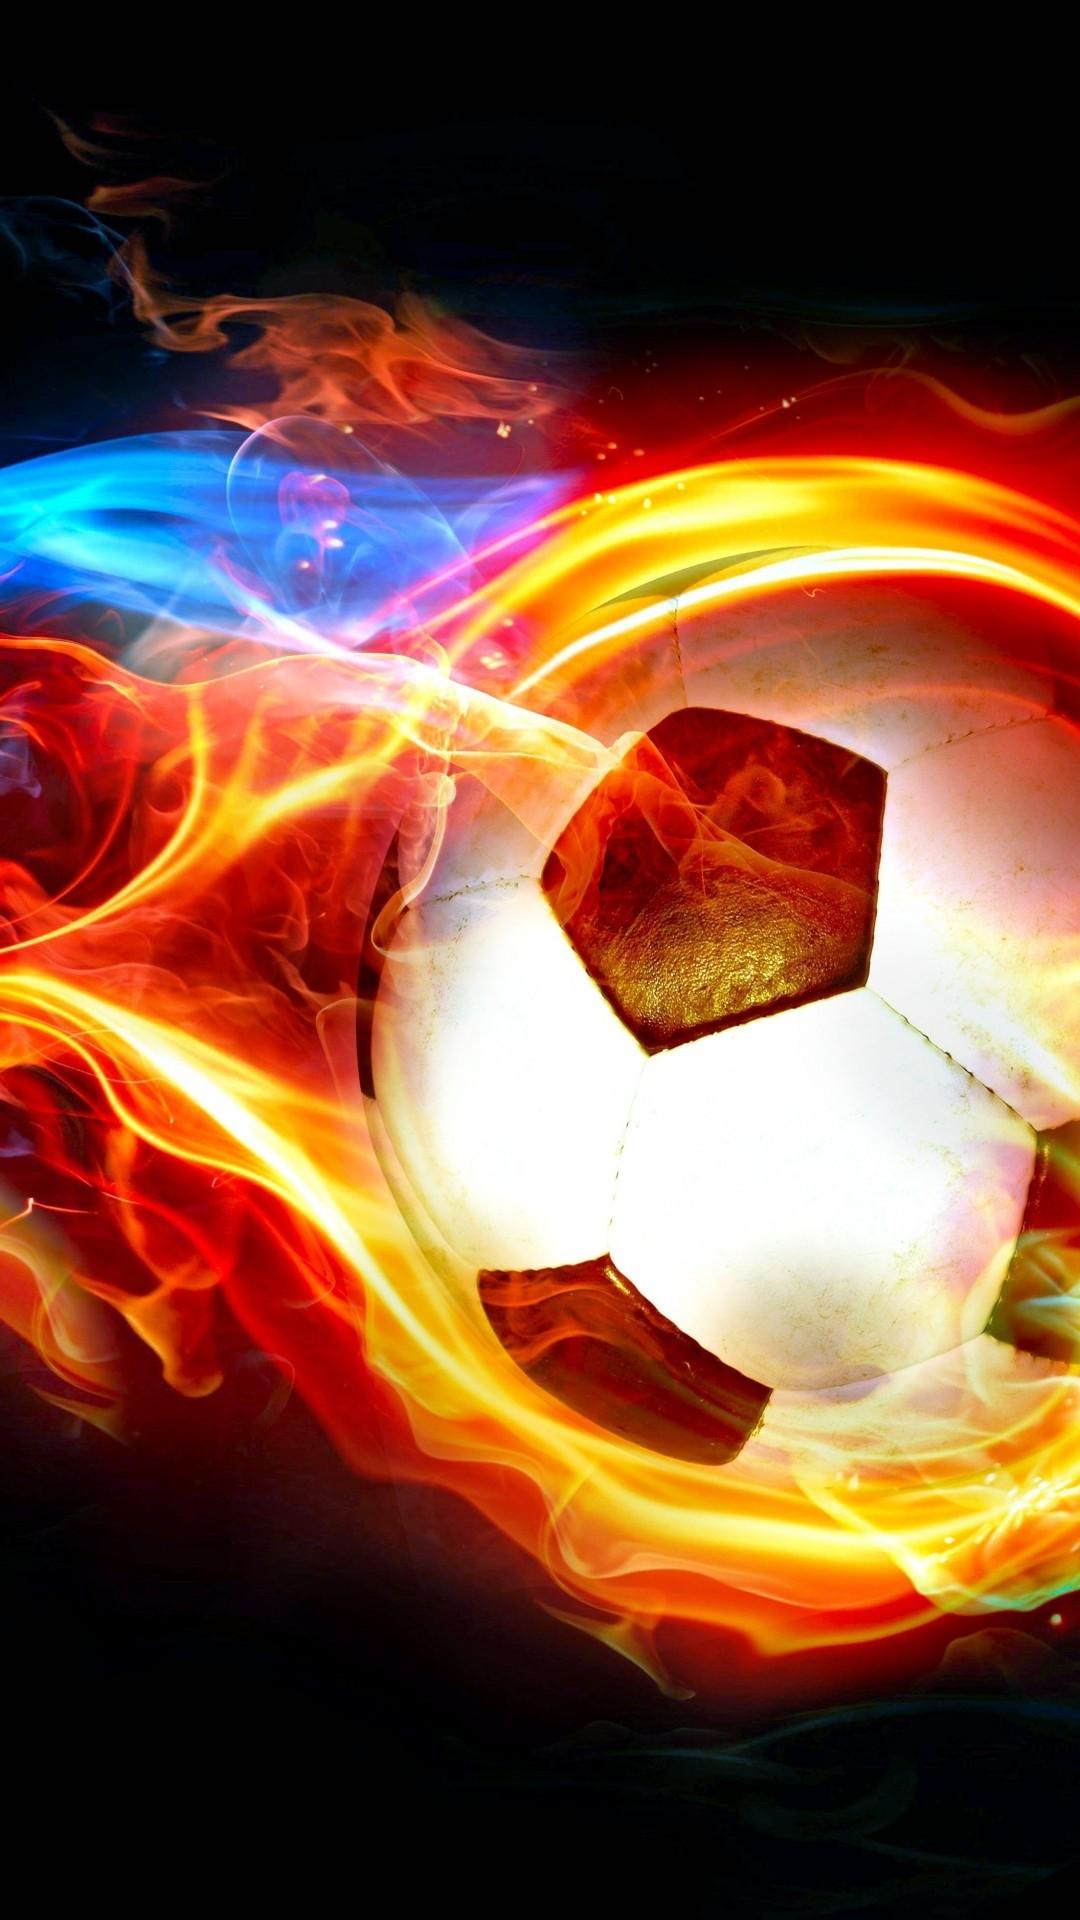 Cool Soccer iPhone hd wallpaper